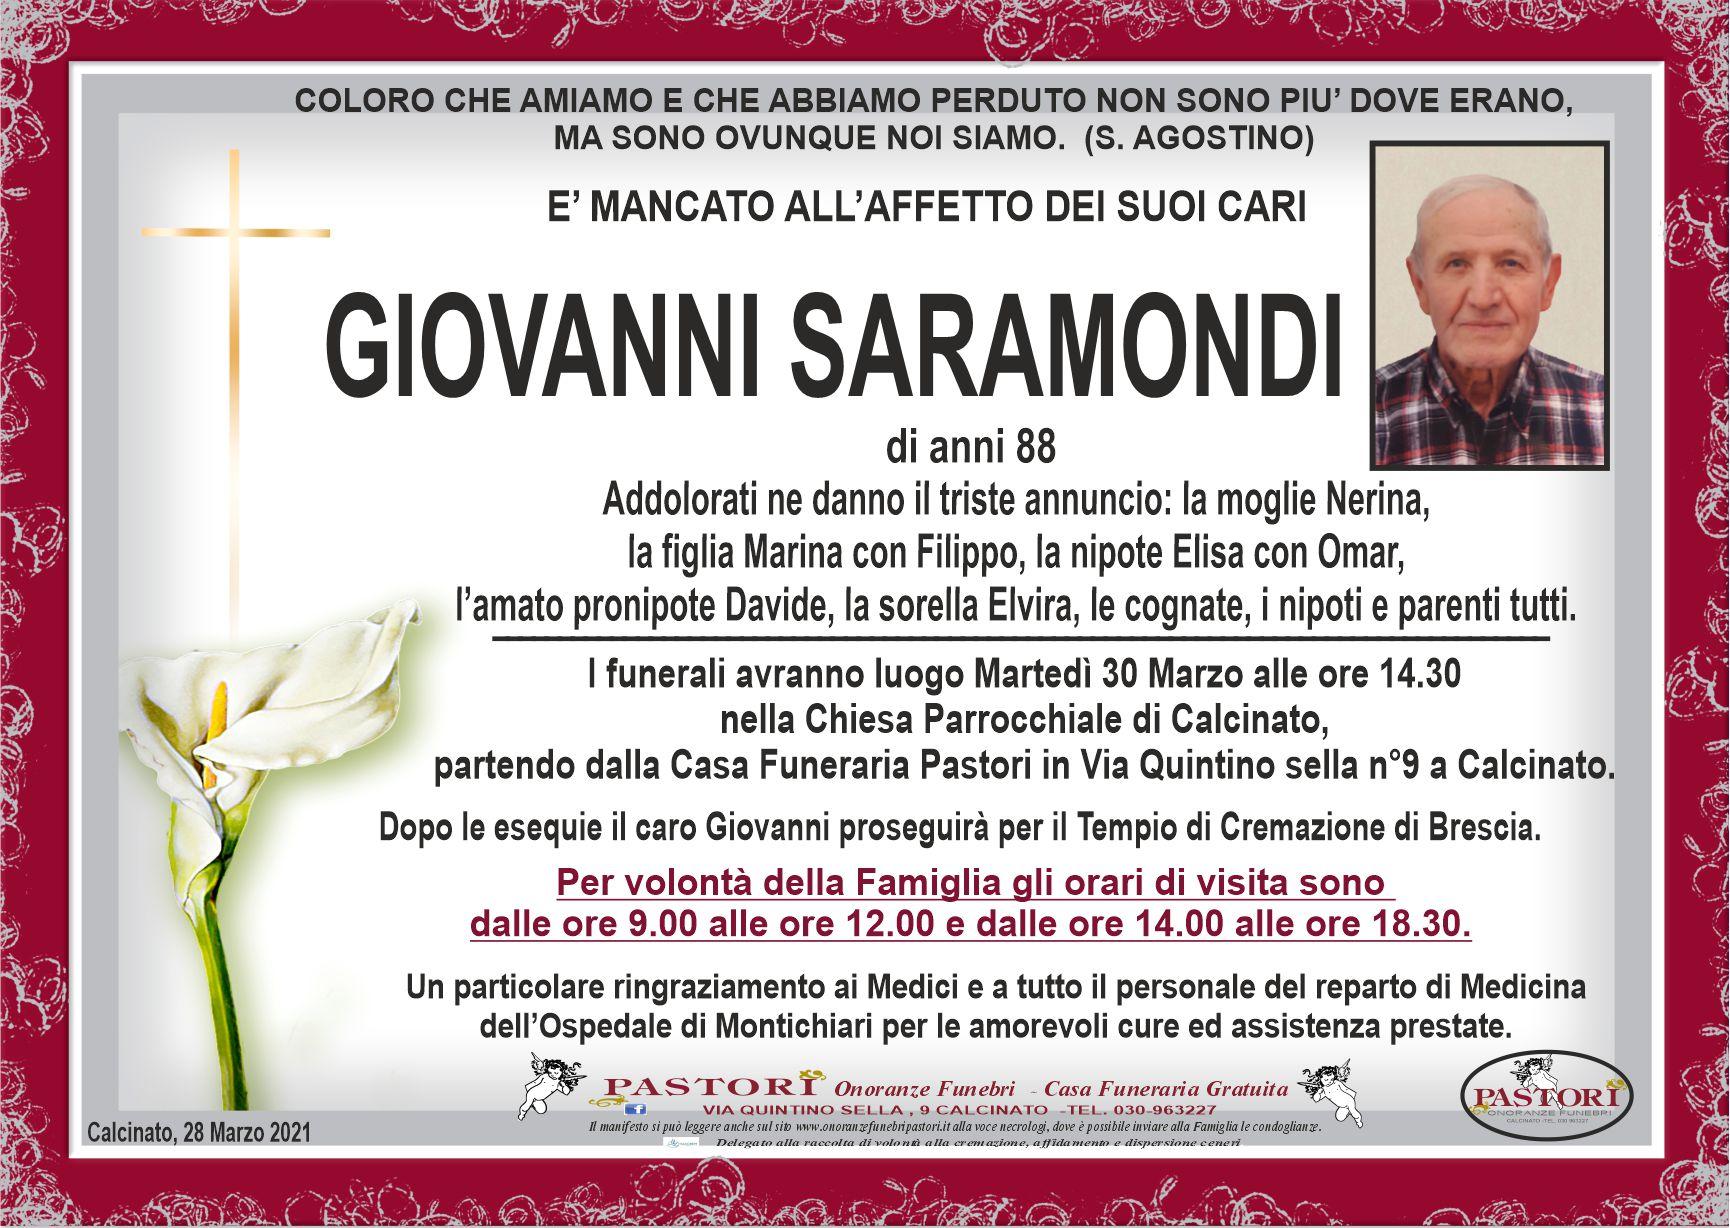 Giovanni Saramondi